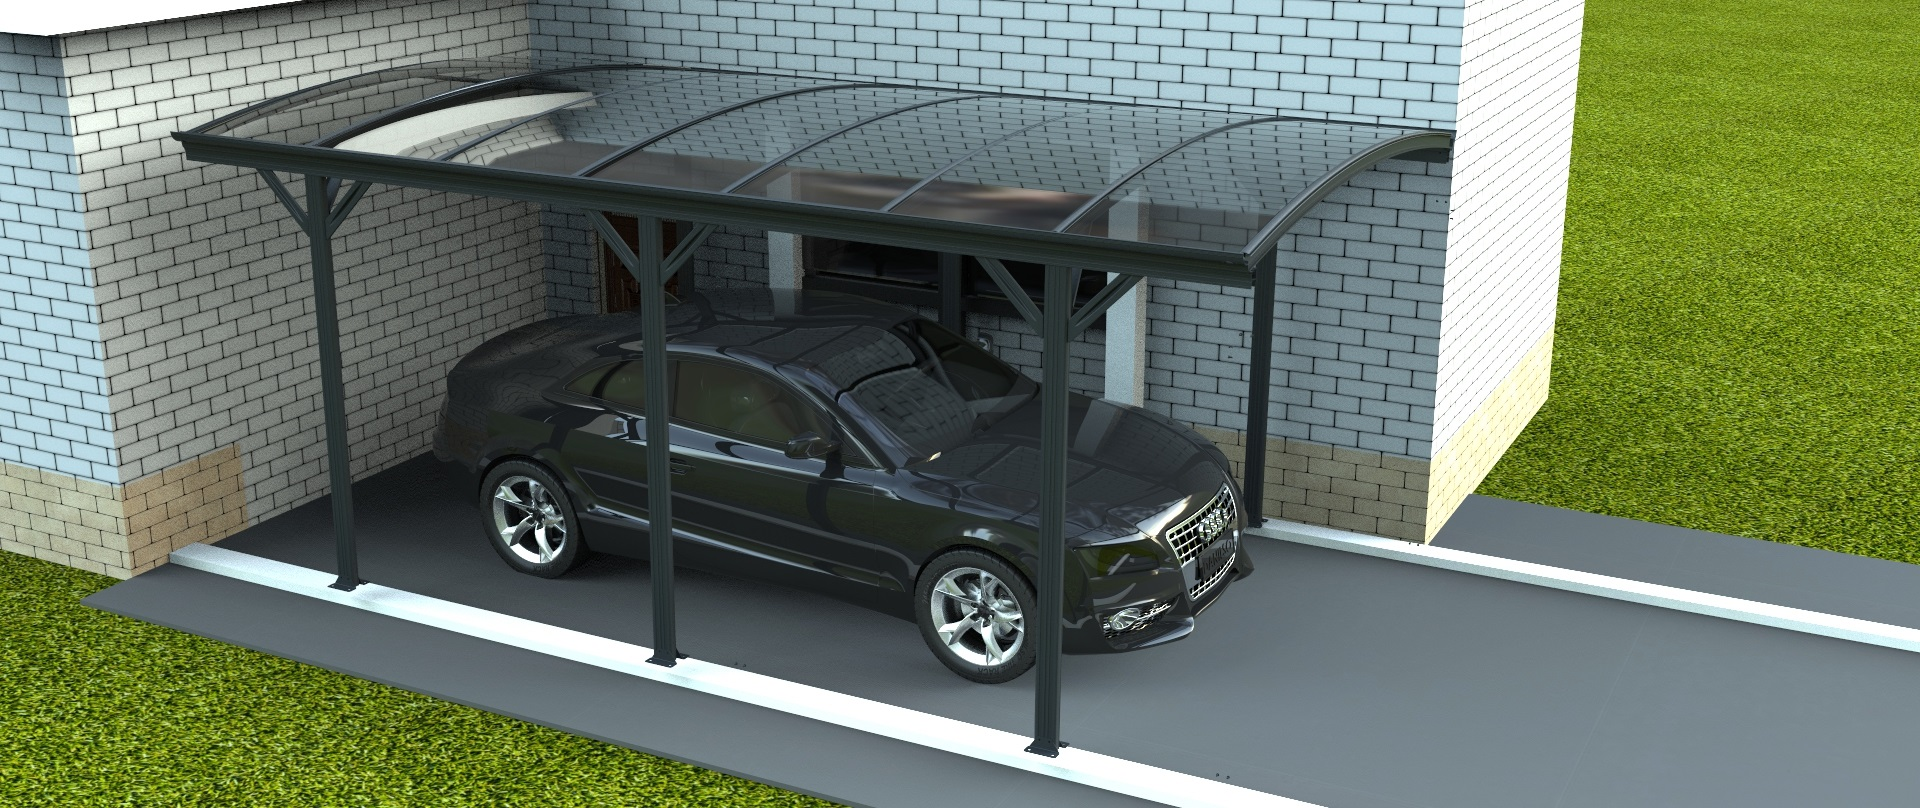 abris de jardin bois pergola aluminium carport en alu pas. Black Bedroom Furniture Sets. Home Design Ideas